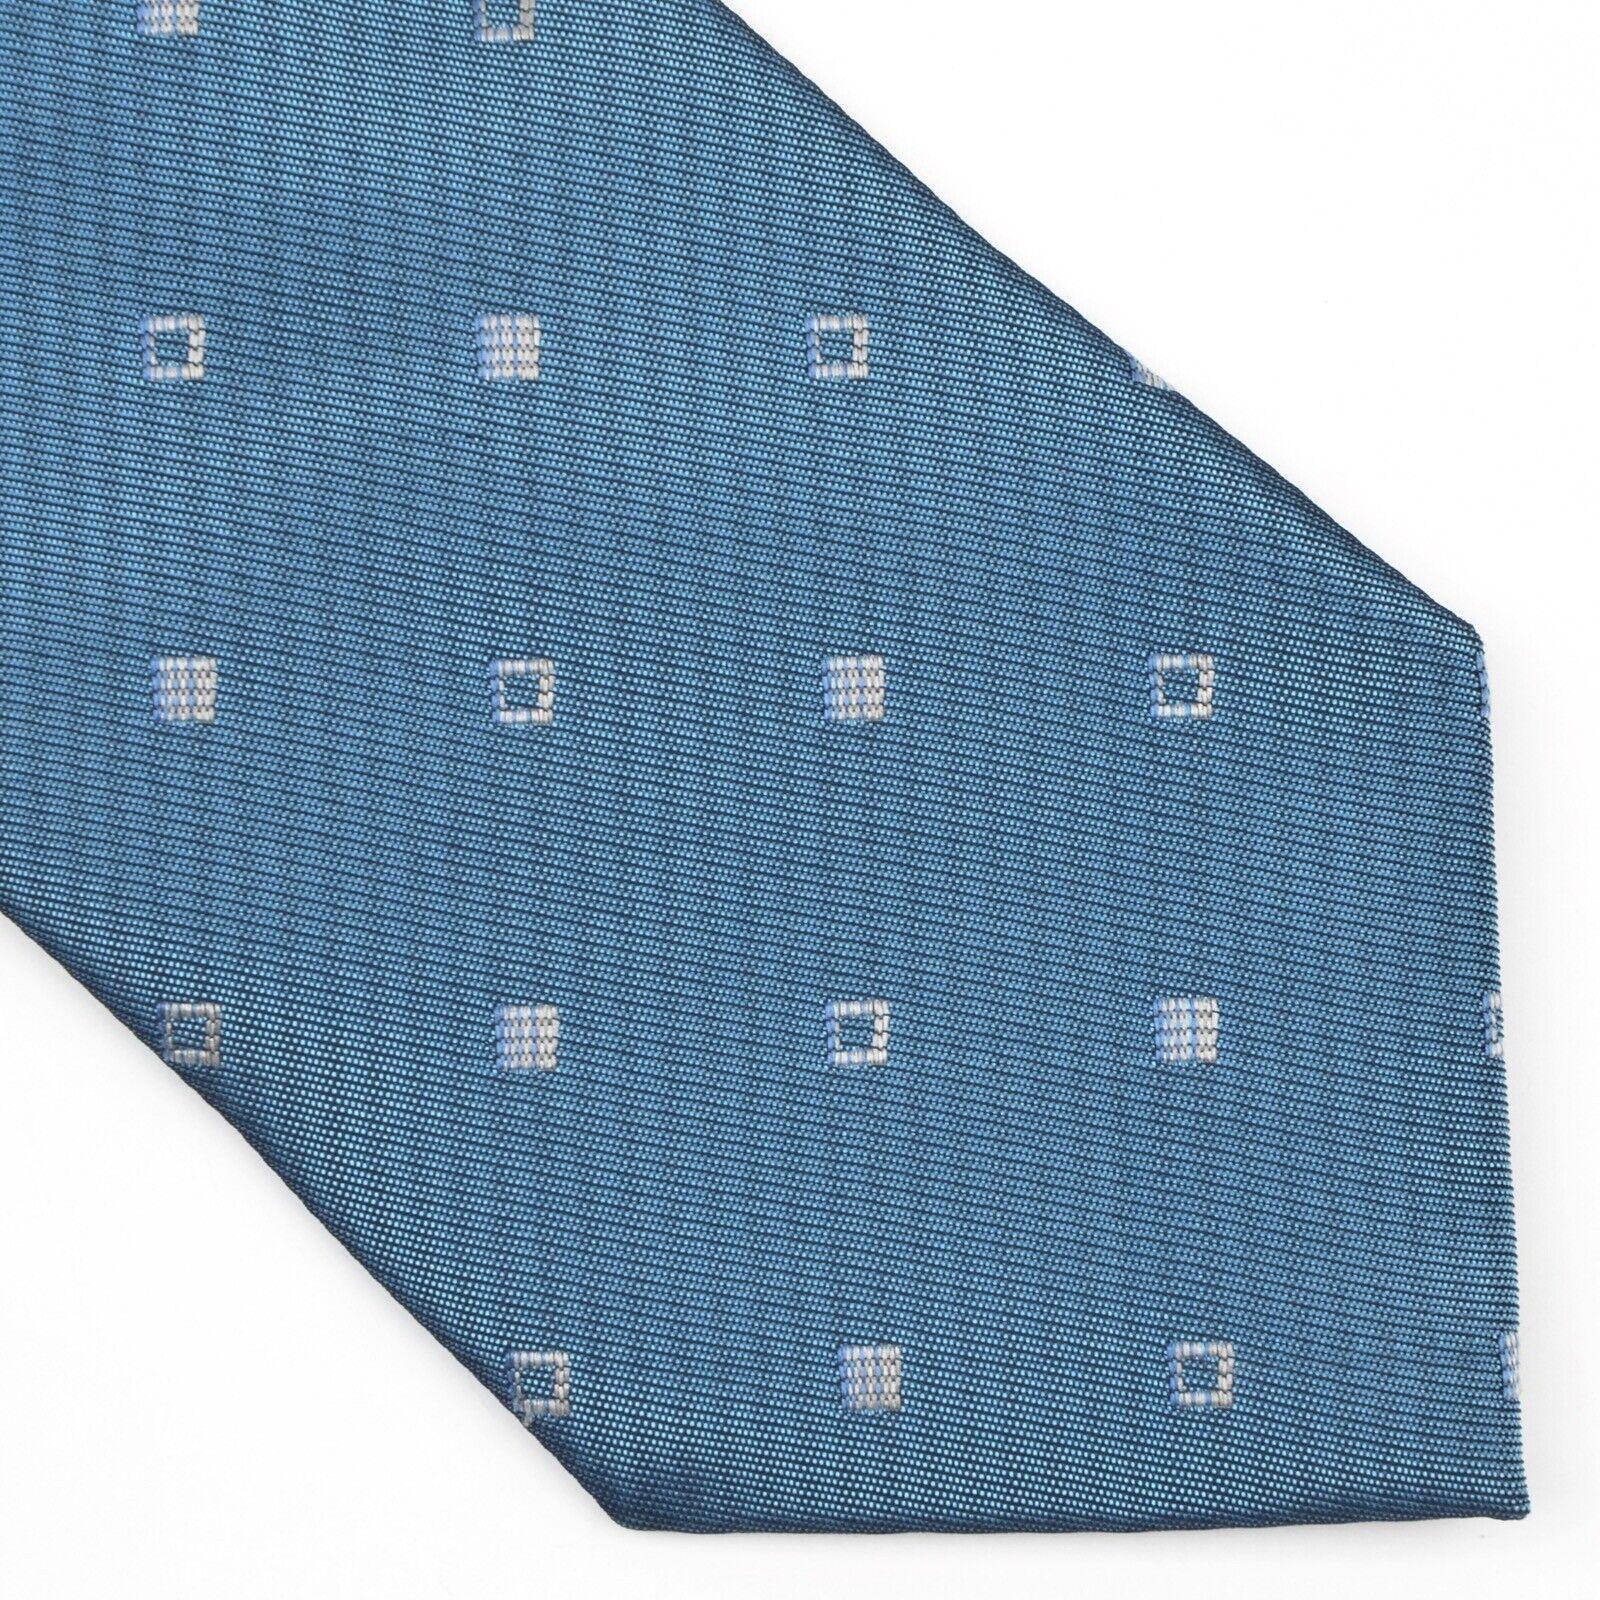 Barberini Roma Krawatte Tie 100% Seide Silk Made in Italy Blau Blue Diamond COOL